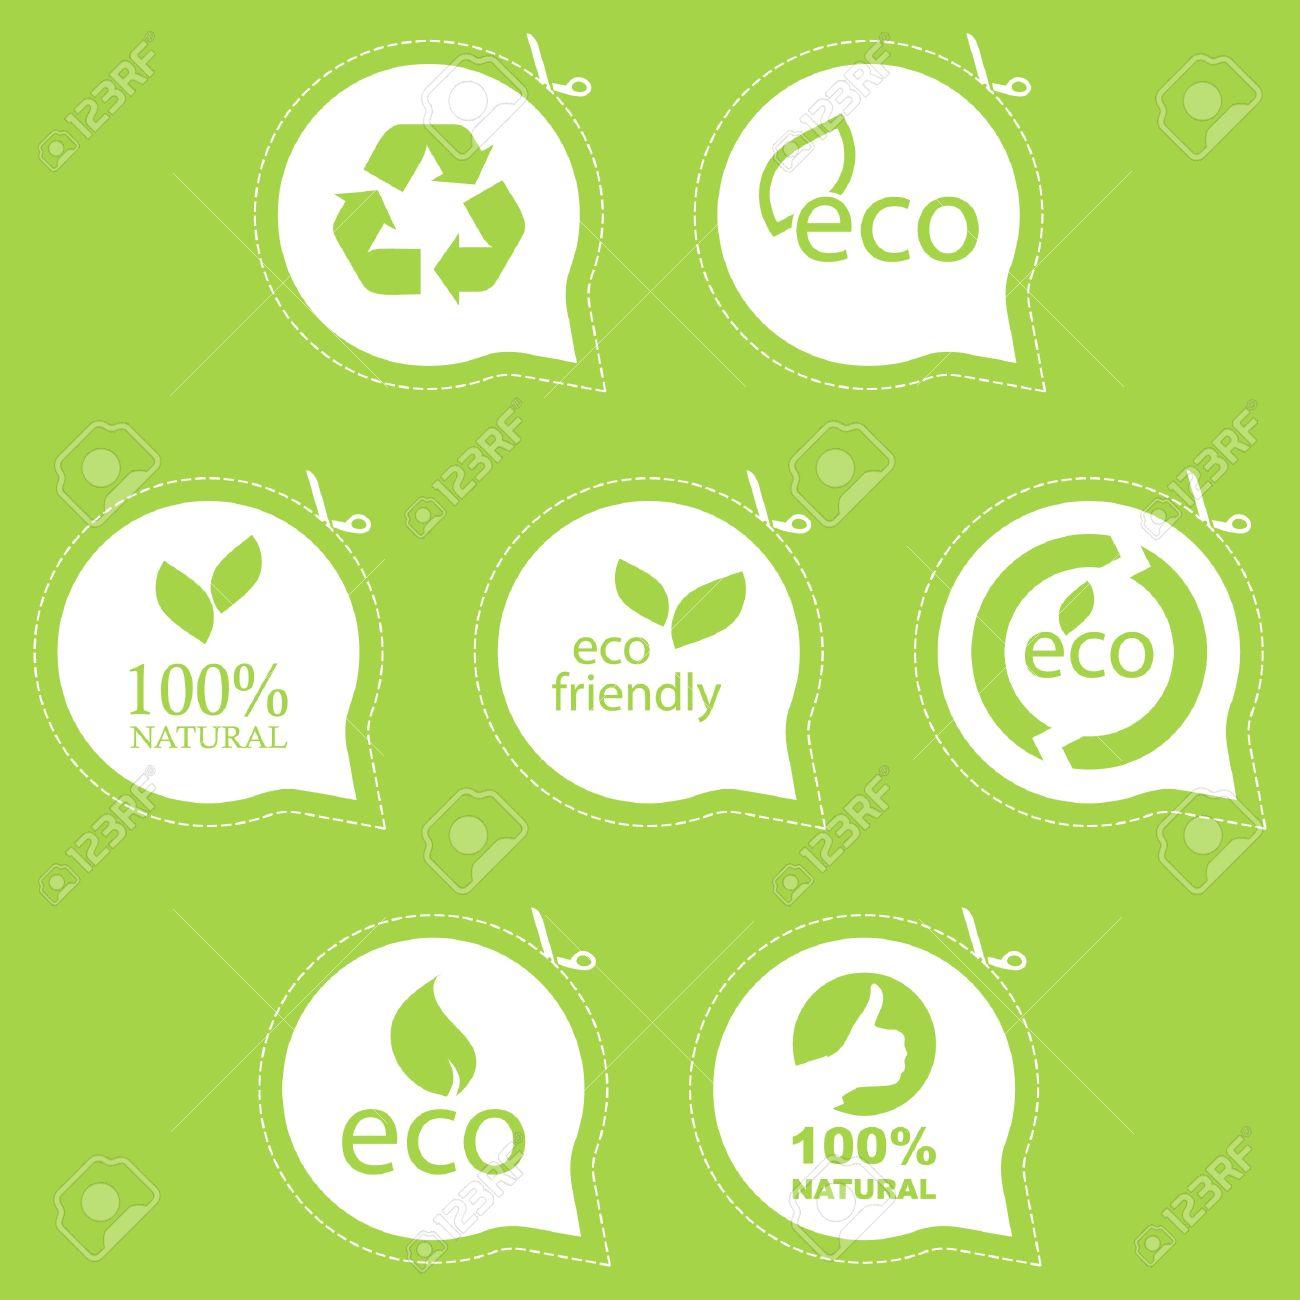 Vegan, Organic, Eco Signs Stock Vector - Image: 58232404